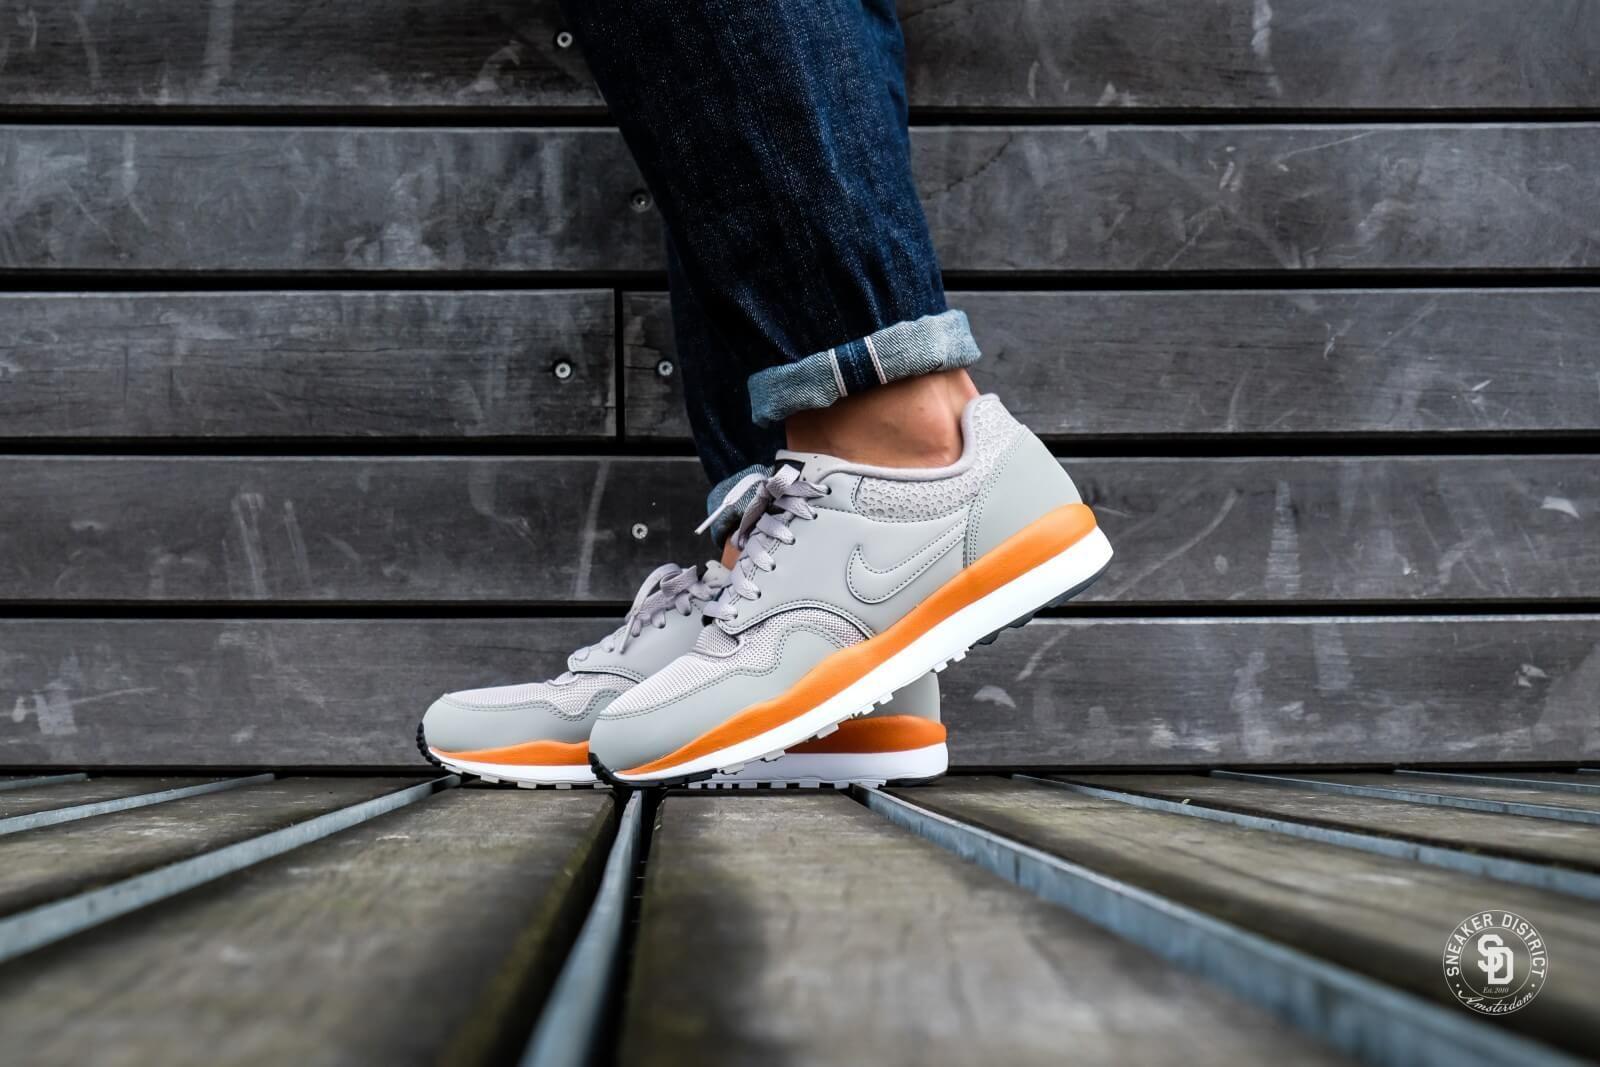 511ac9382901 Nike Air Safari Cobblestone Monarch-White - 371740-007